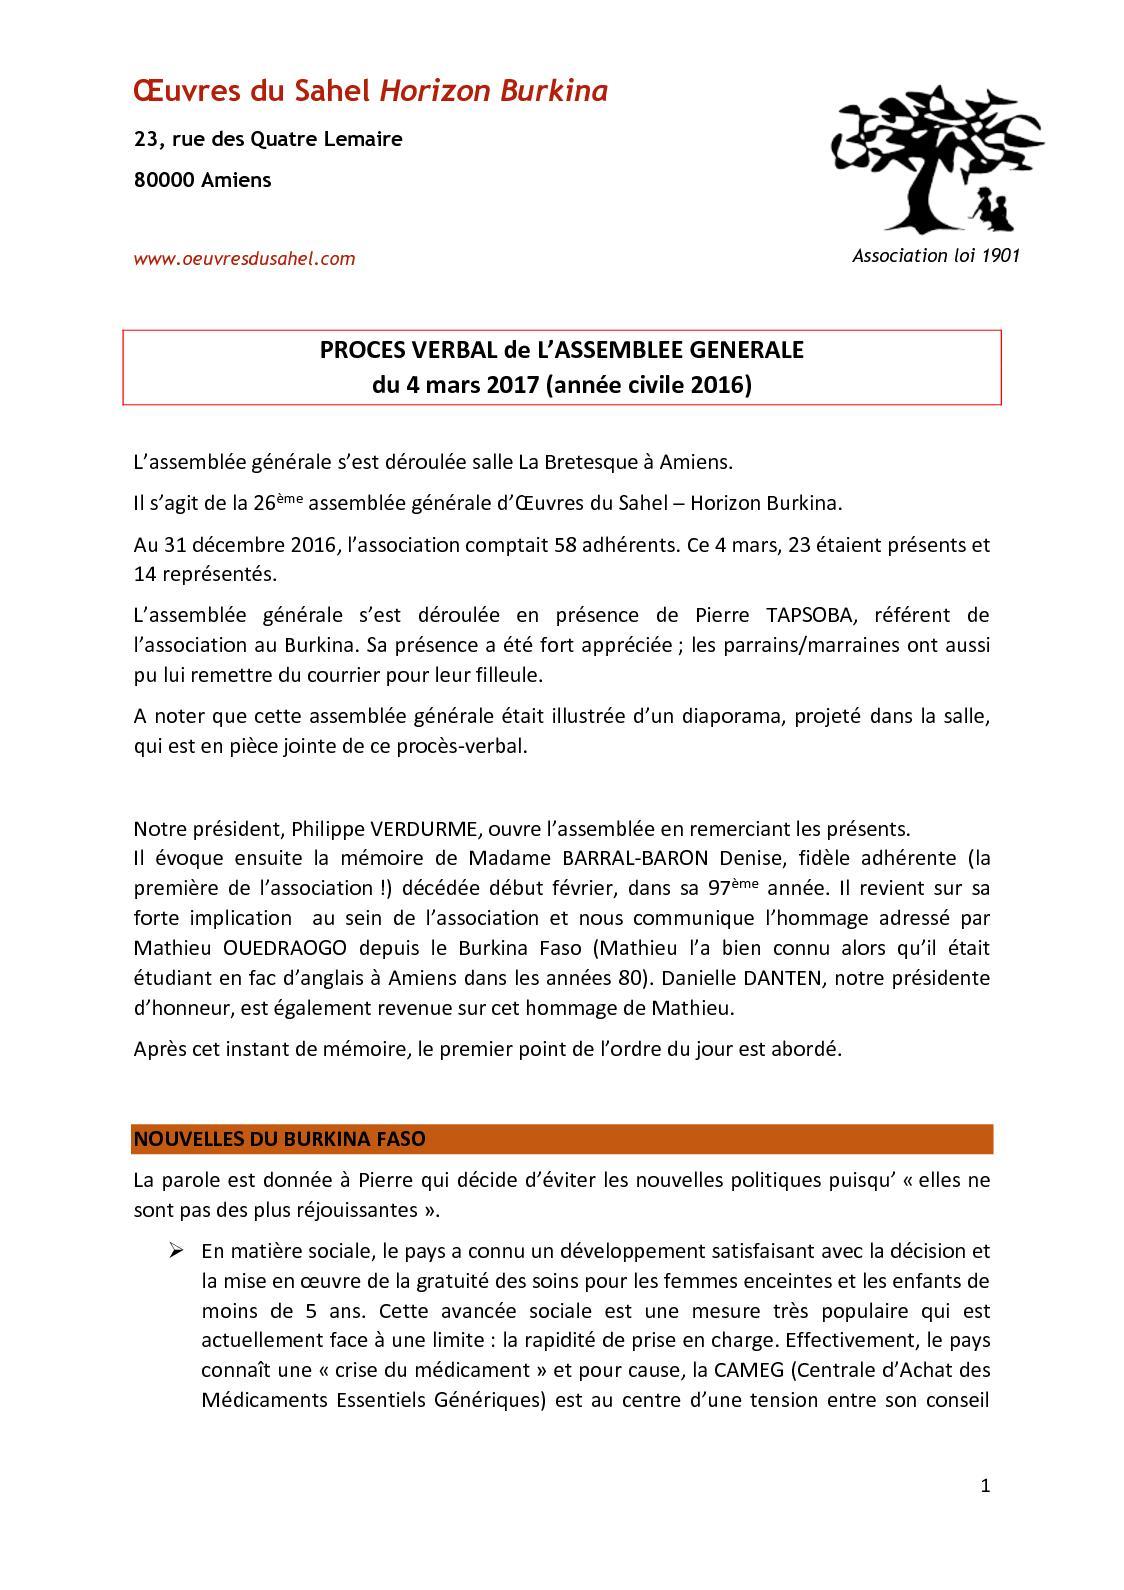 Calameo Proces Verbal De L Assemblee Generale Du 4 Mars 2017